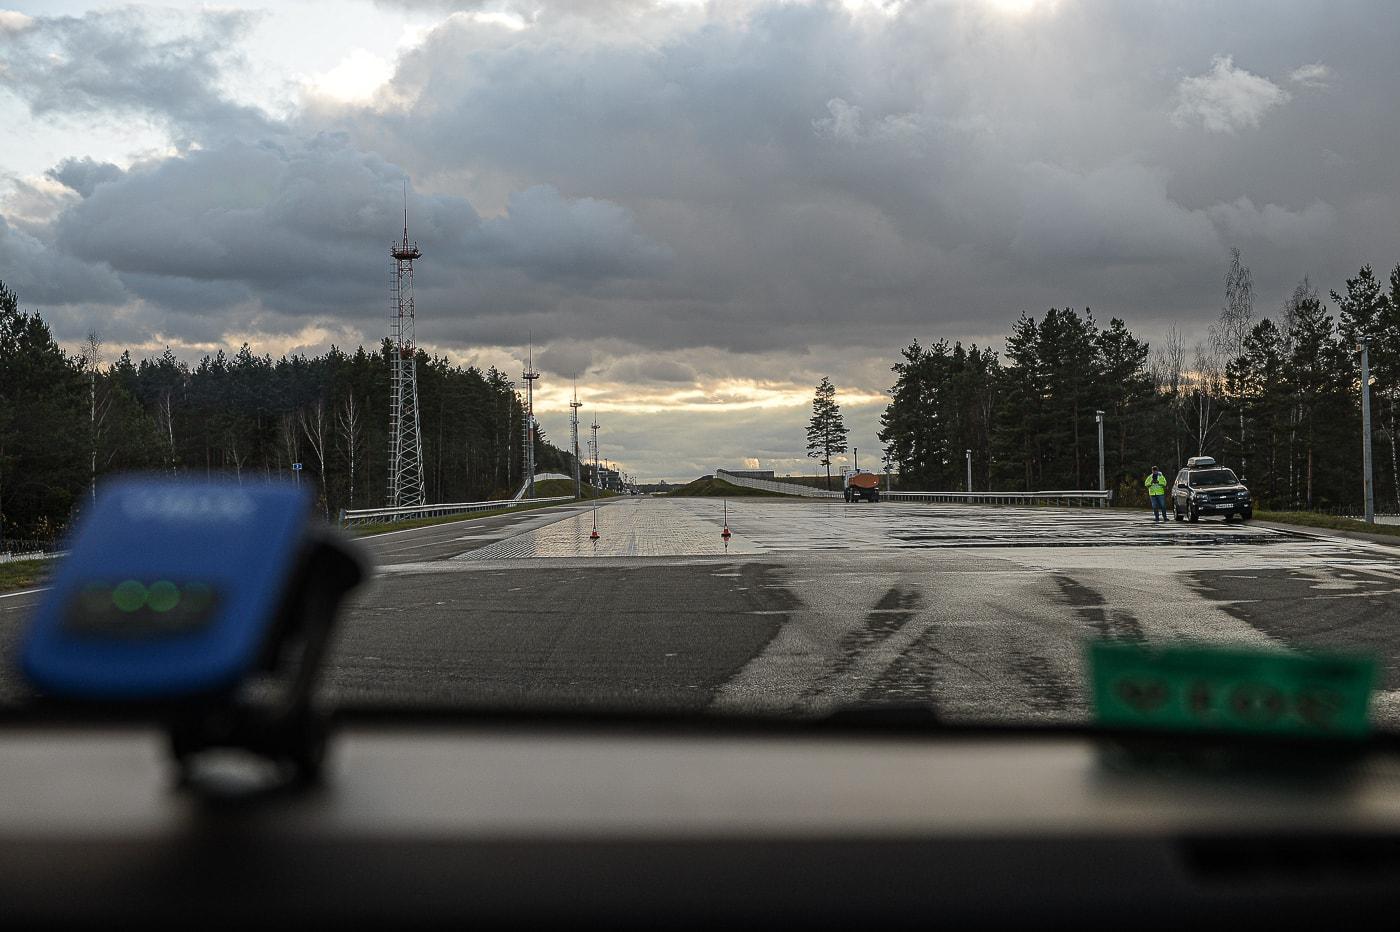 Onliner.by : Тормозной тест зимних шин на мокром базальте с 40 км час